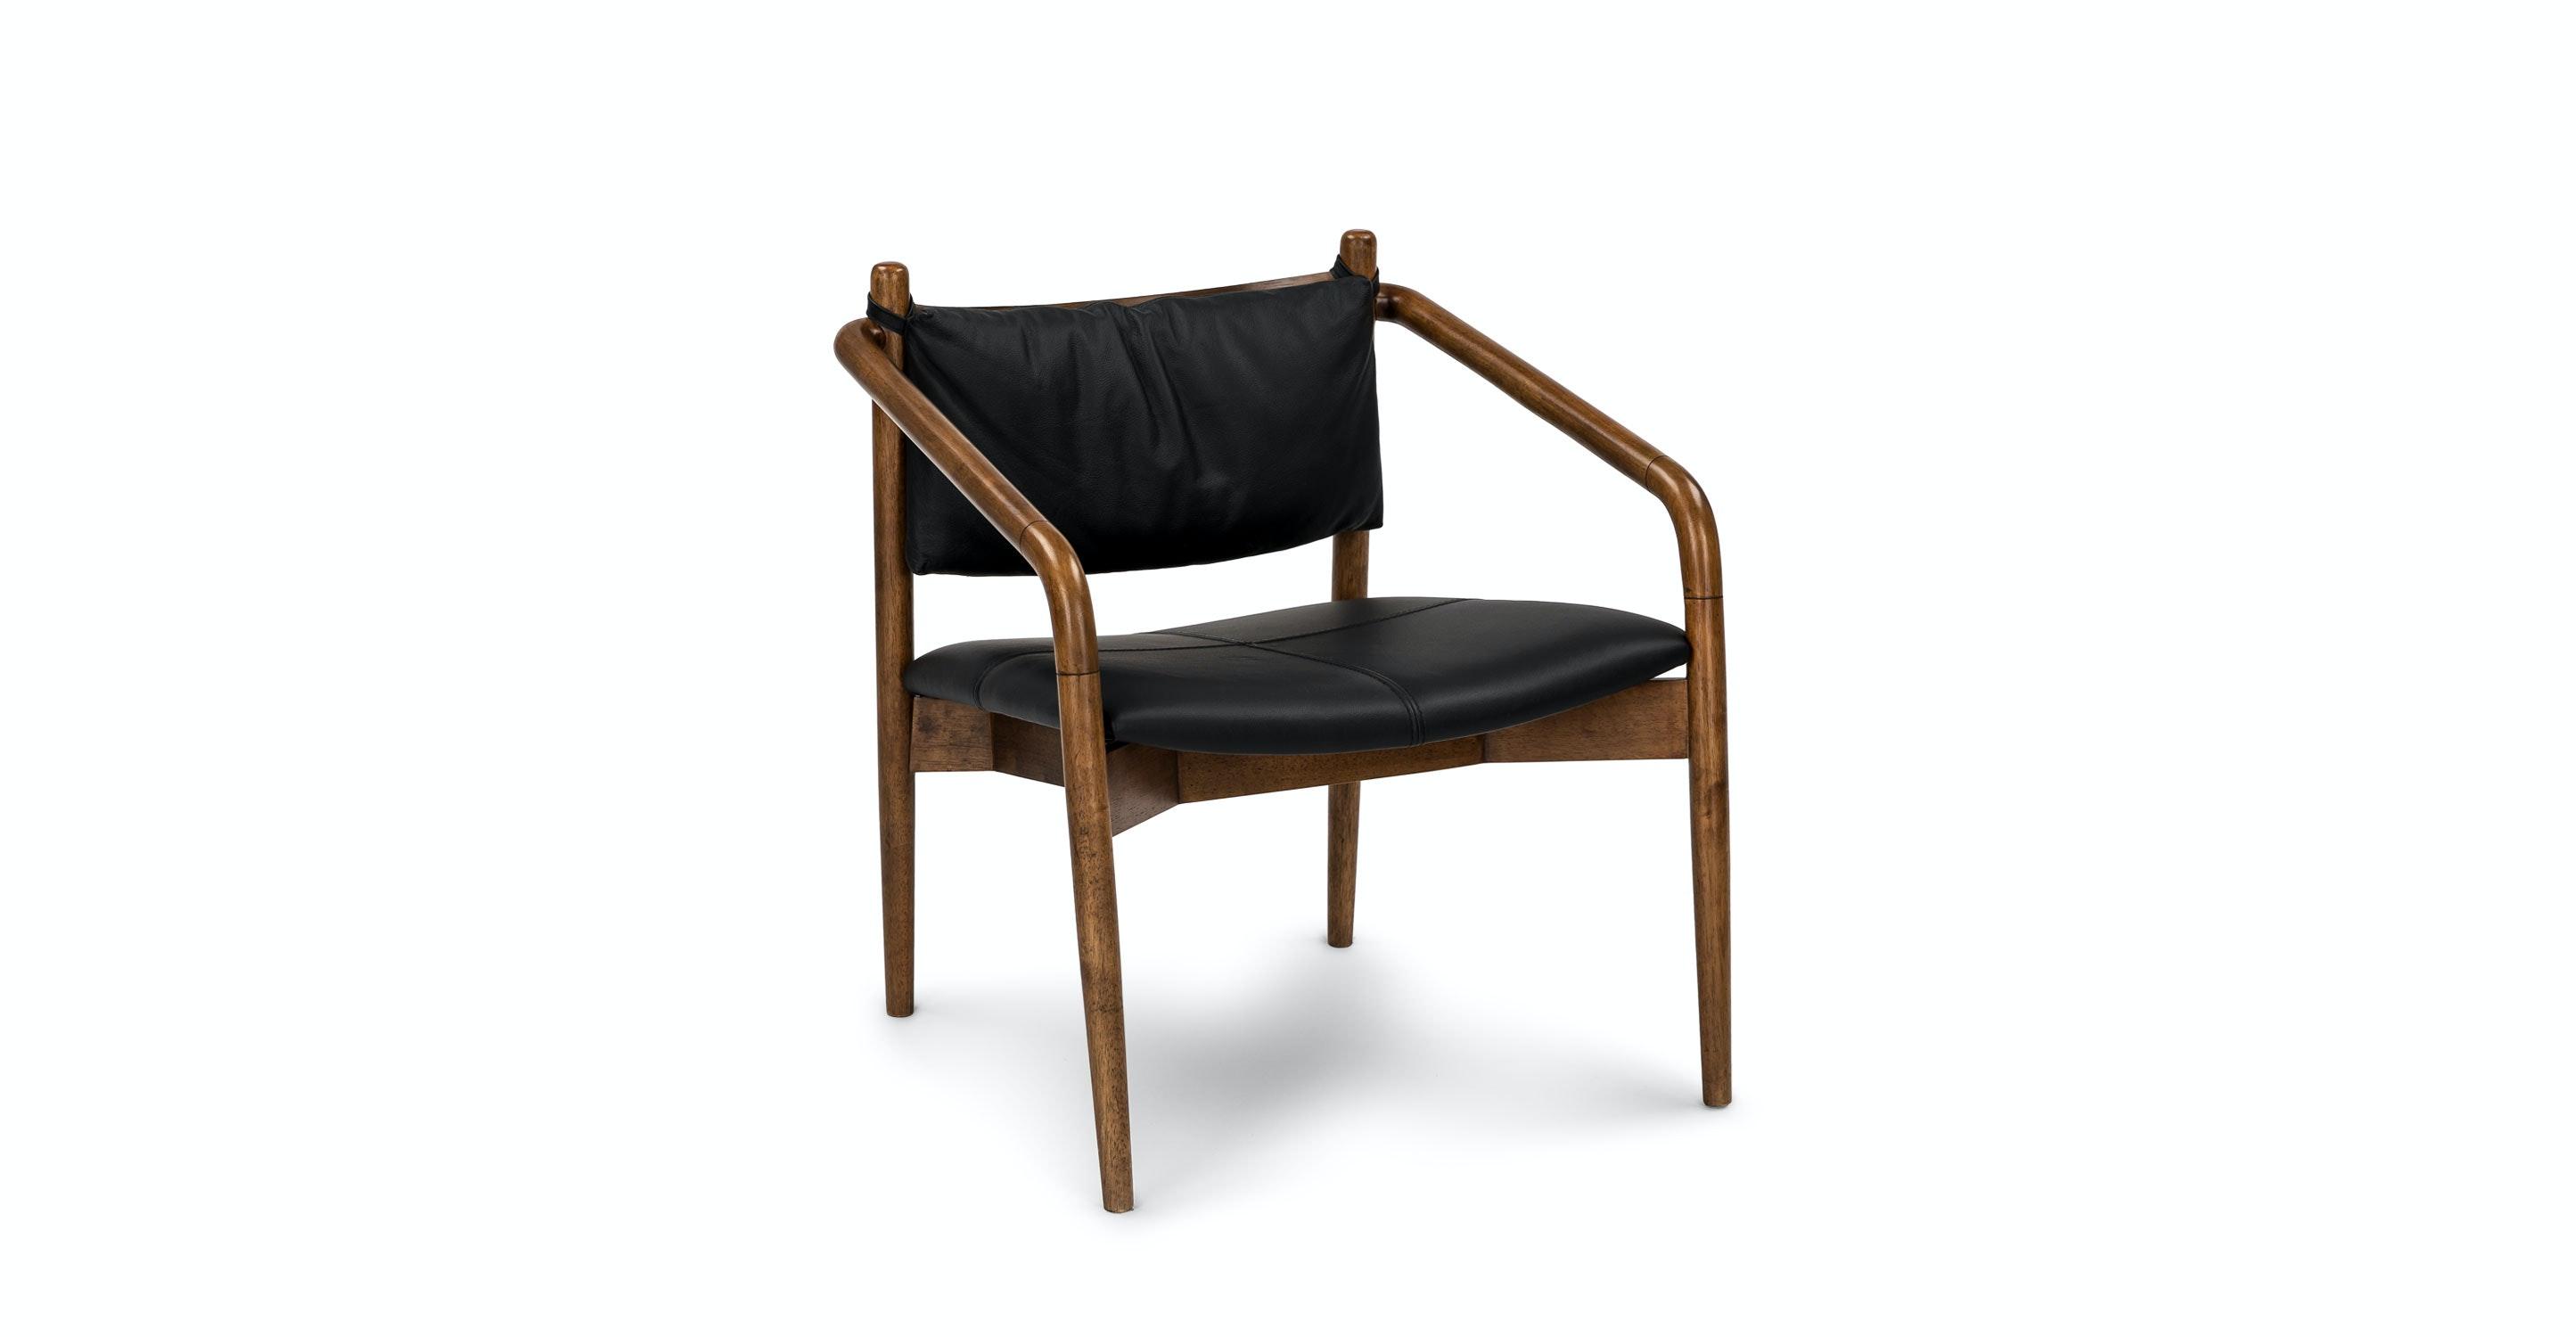 Merveilleux Lento Black Leather Lounge Chair